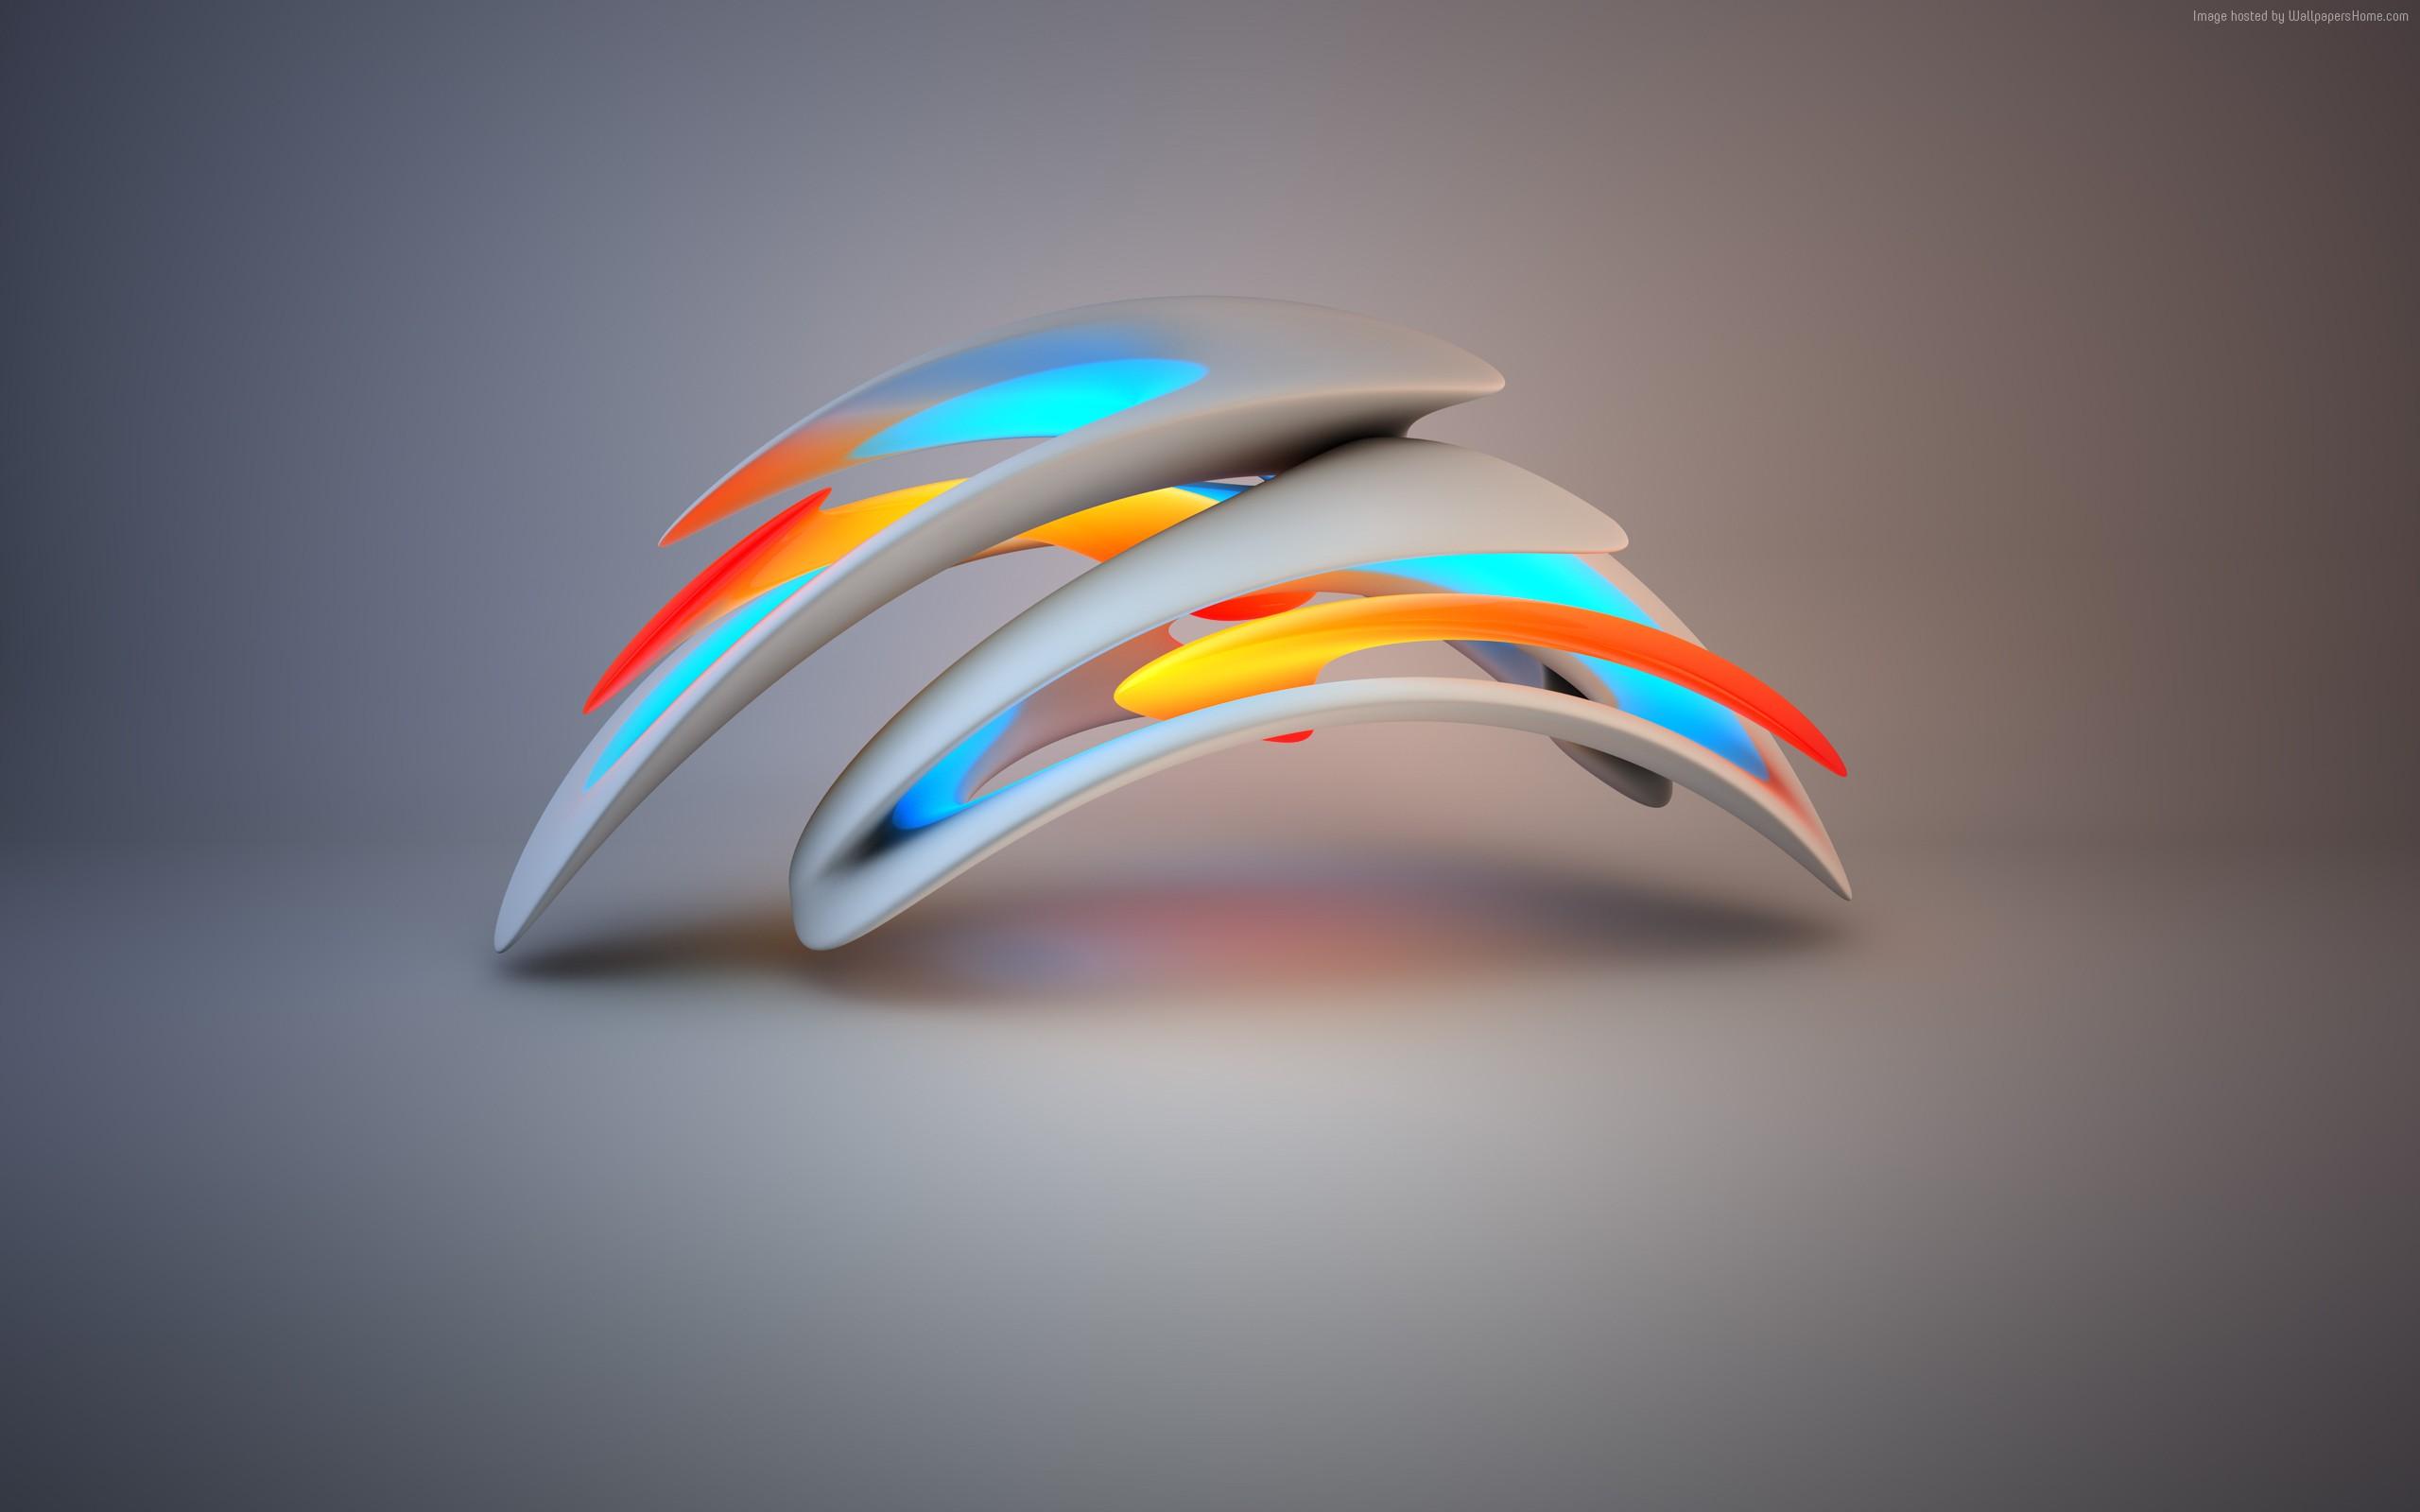 3d abstract artwork hd